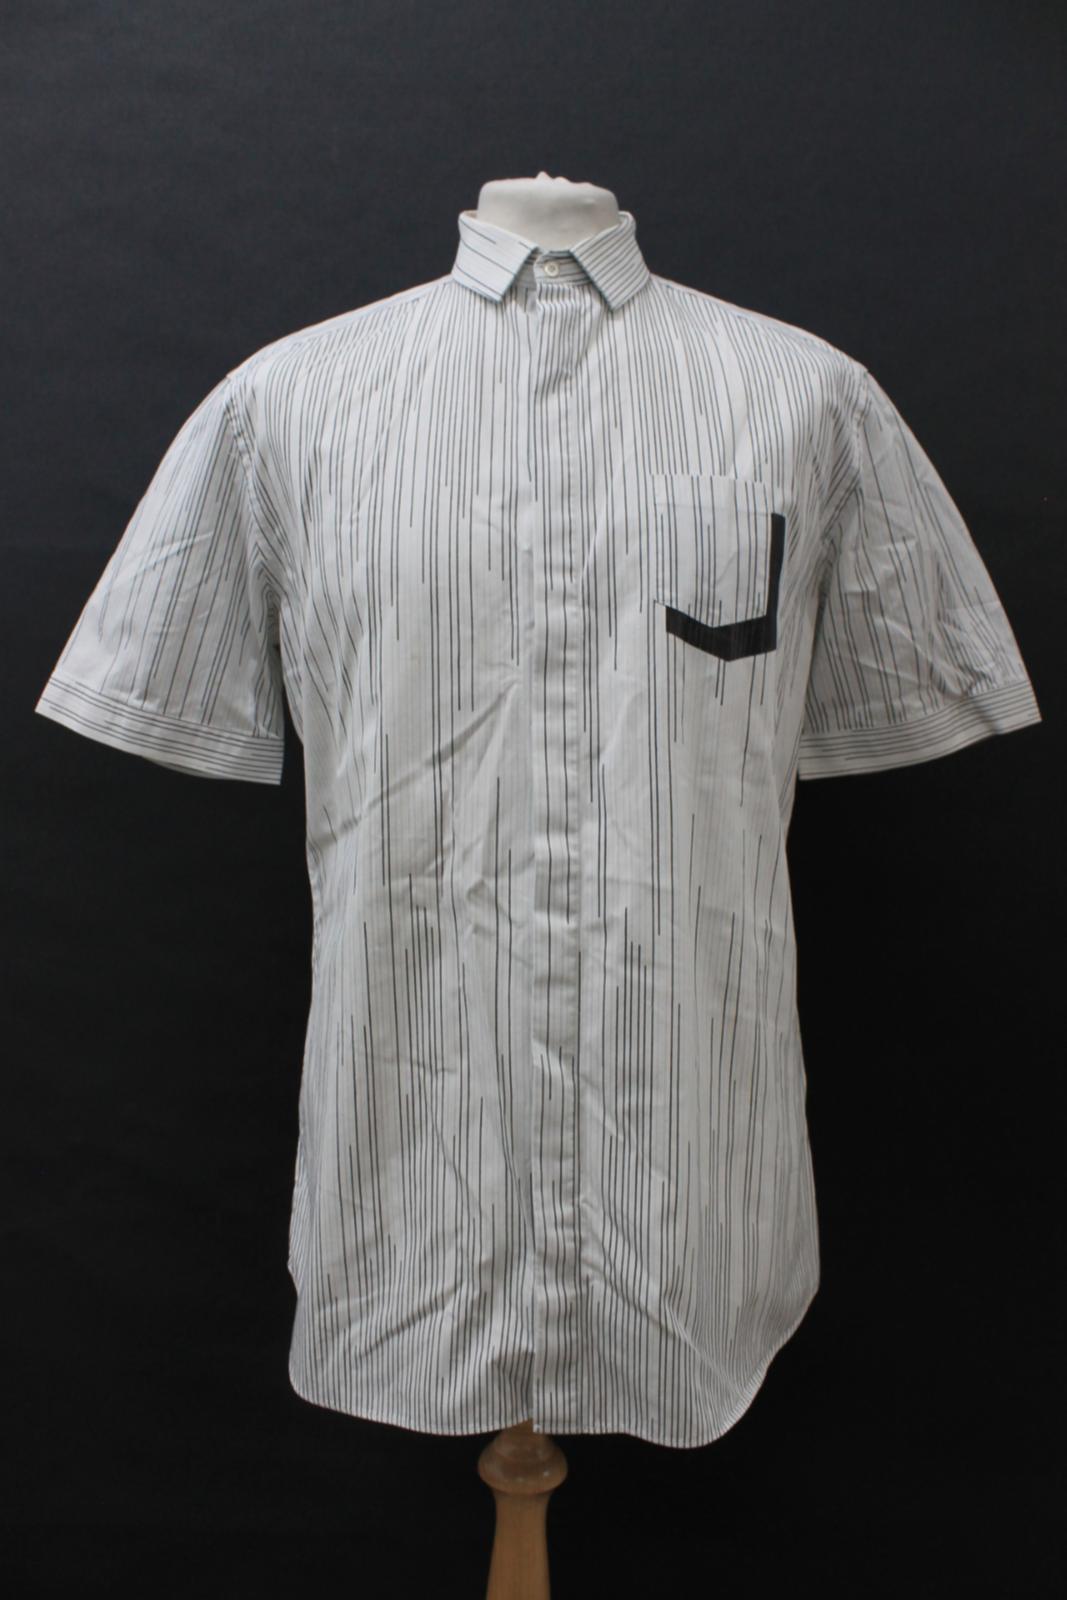 Neil-Barrett-Hombre-Blanco-Algodon-De-Rayas-Camisa-De-Manga-Corta-Estampado-de-bolsillo-16-5-034 miniatura 2